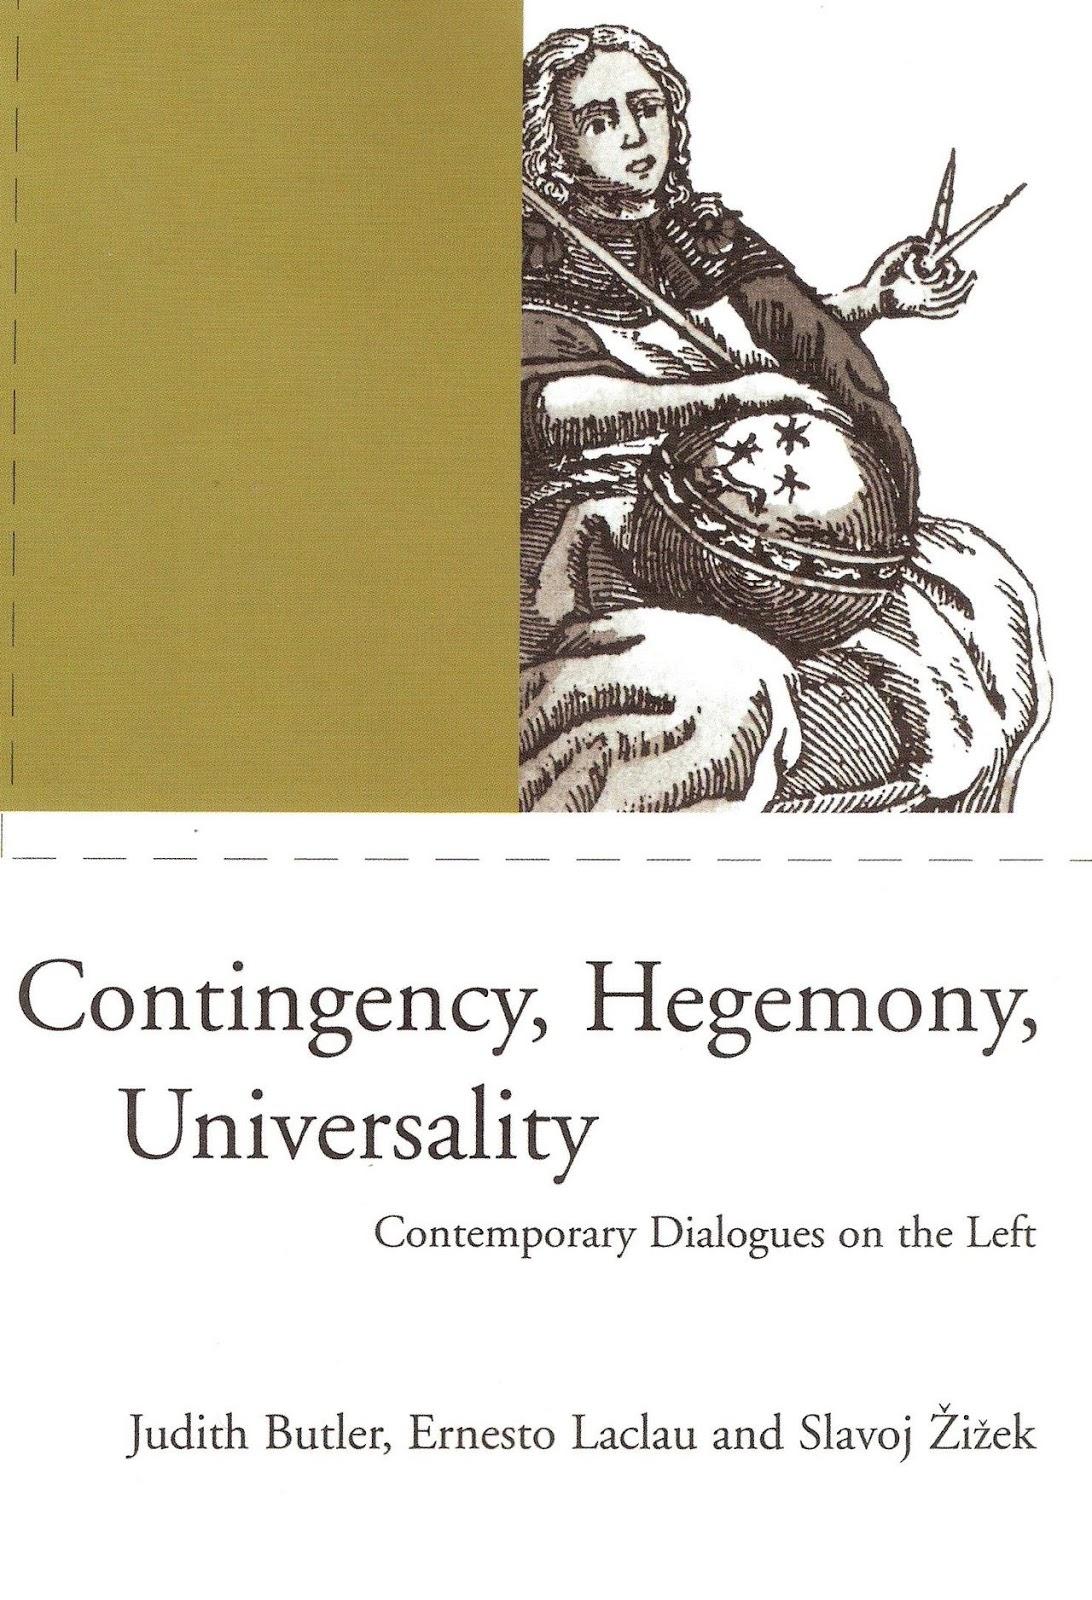 rethinking gramscis political philosophy essay The gramscis themselves had enjoyed the a core concept of gramsci's political philosophy and pedagogy: an interpretative framework in: pizzolato.